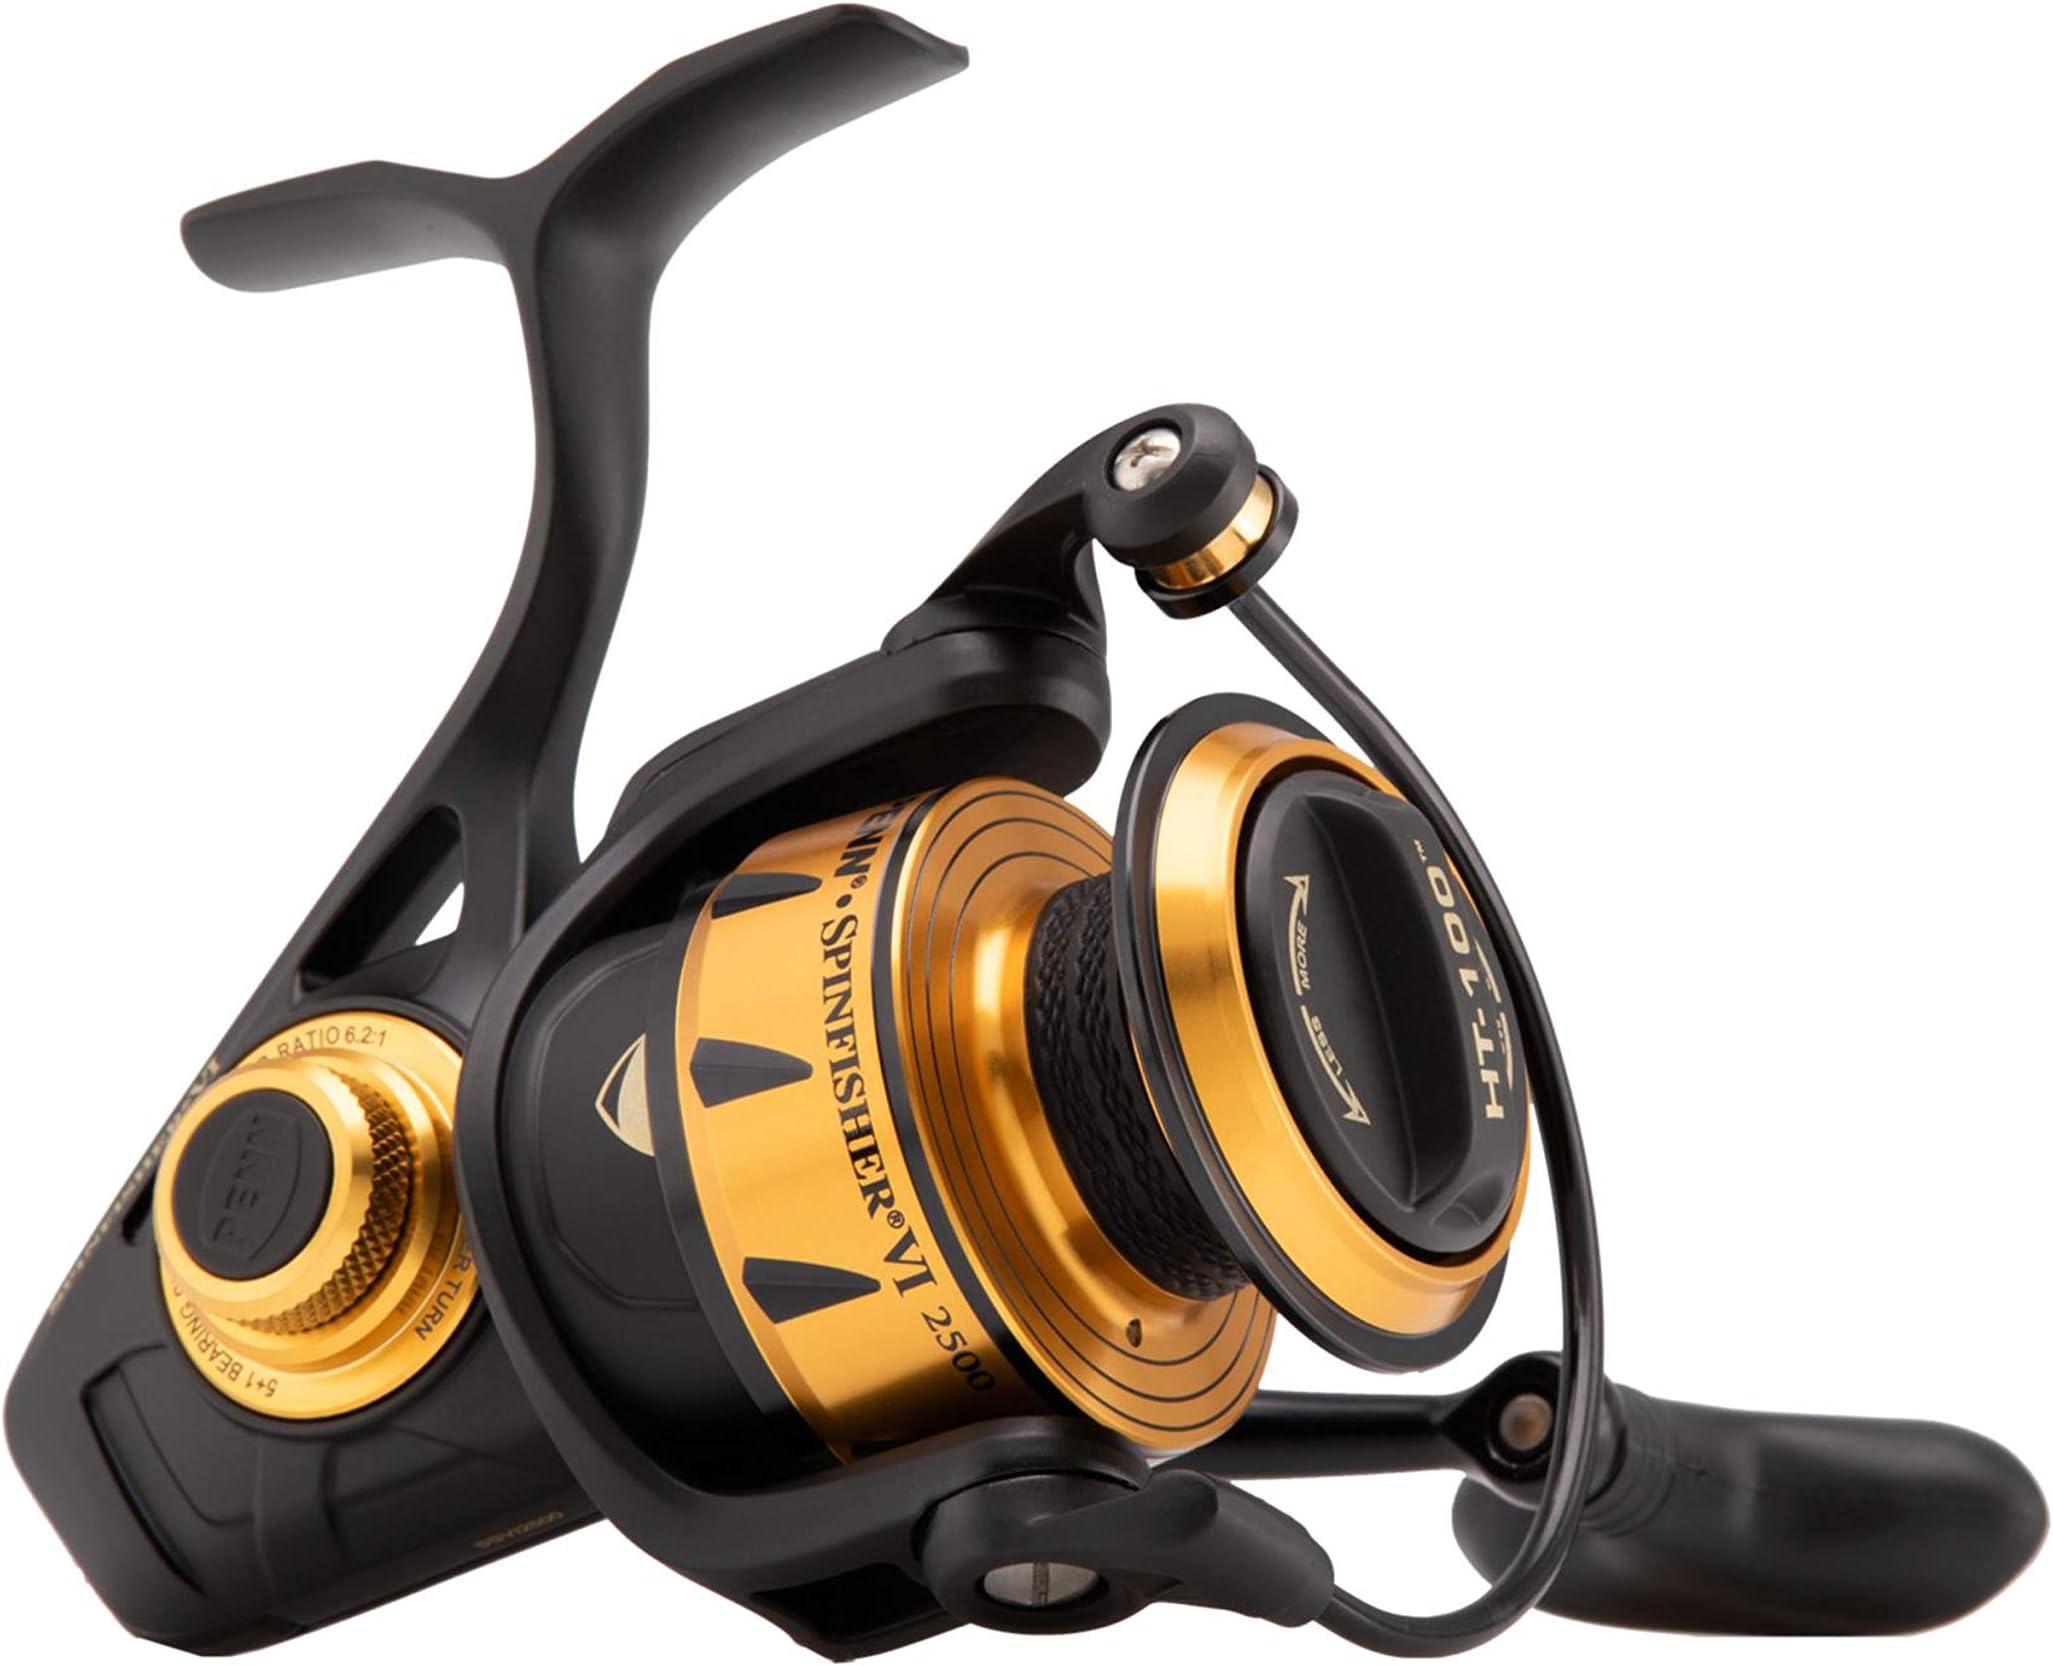 Penn Spinfisher VI Spinning Fishing Reel